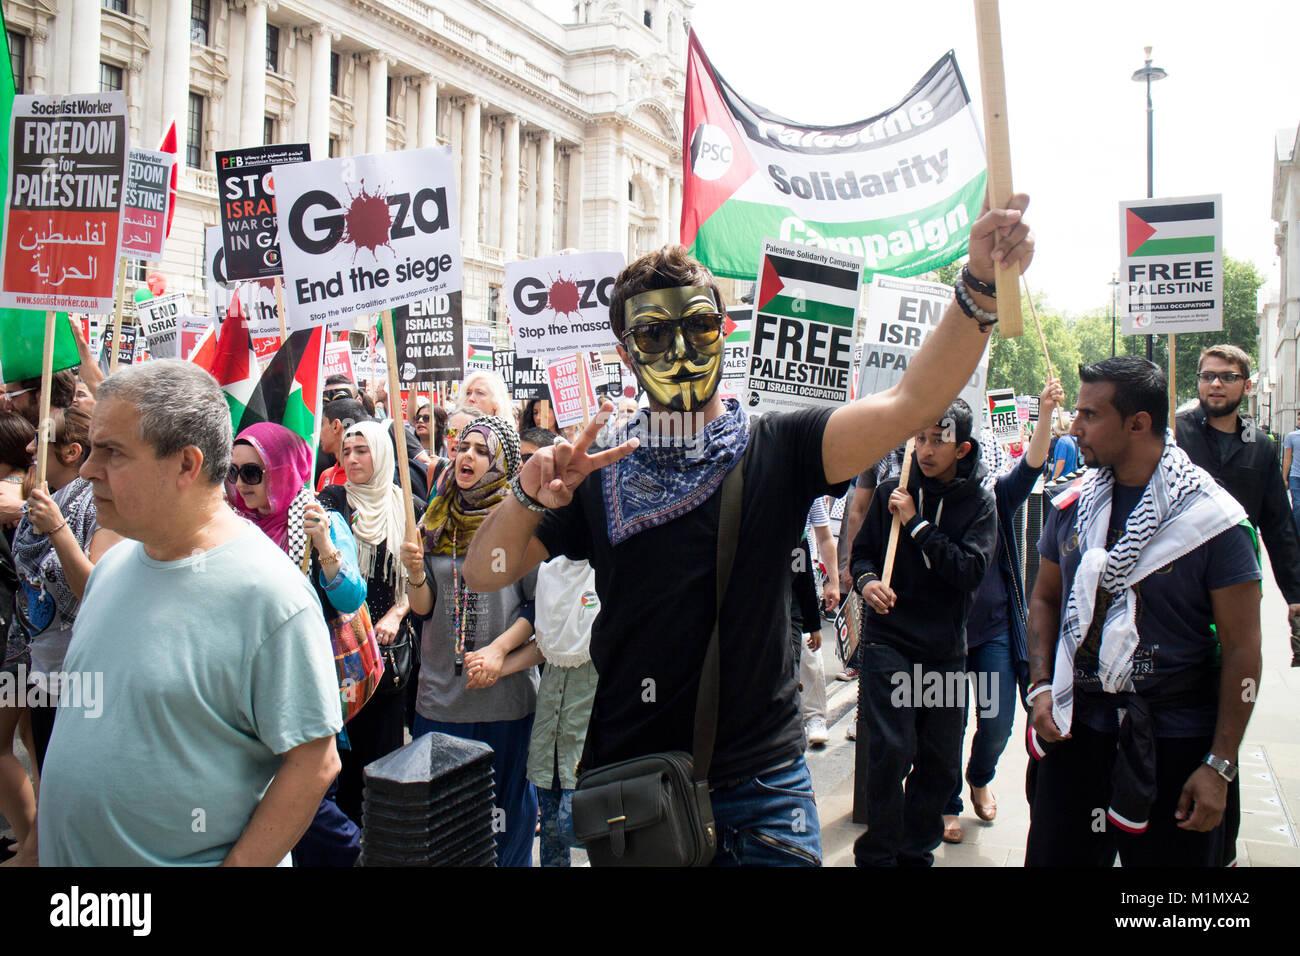 Stop the killing, Gaza March - Stock Image